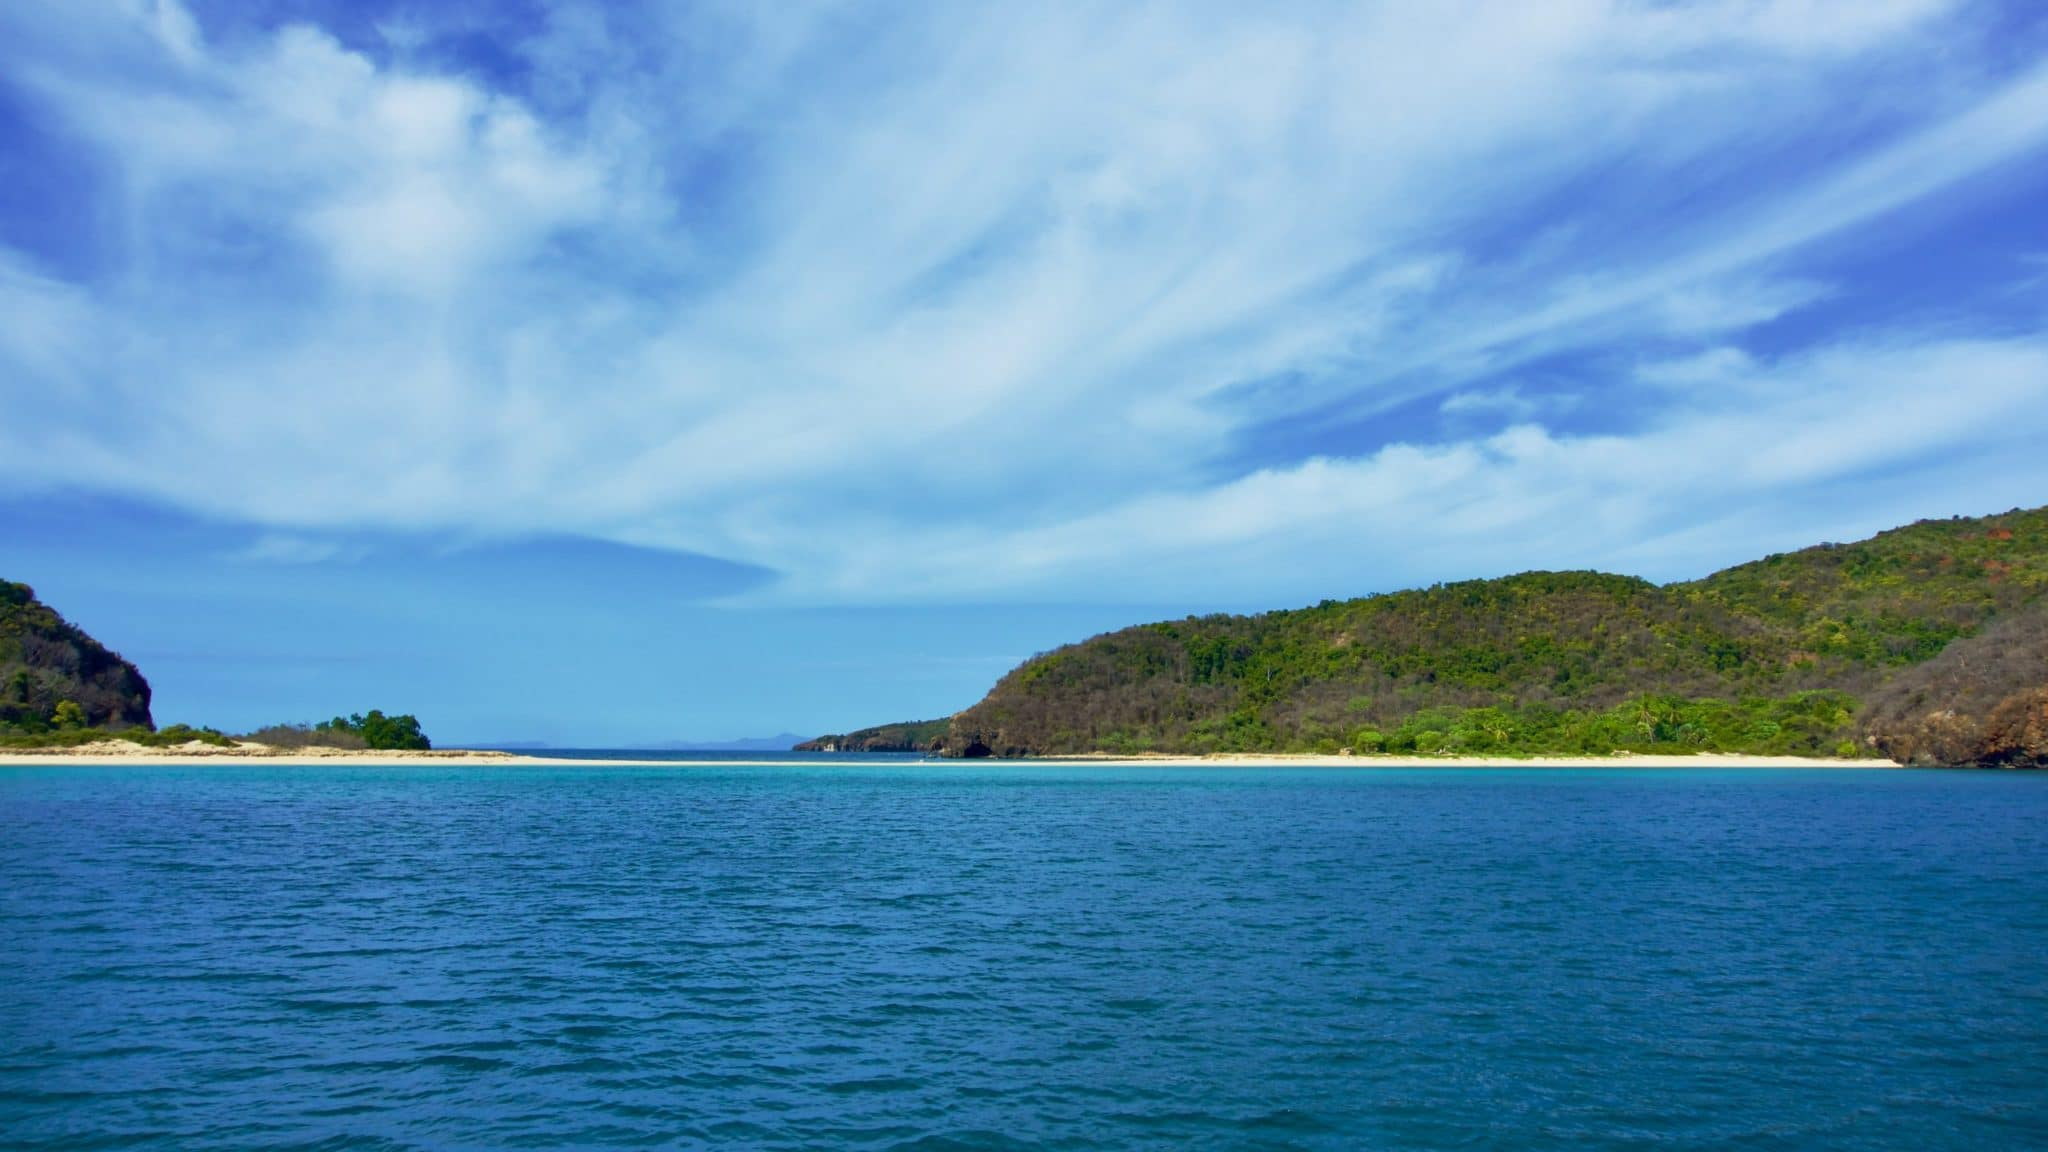 Les îles Mitsio